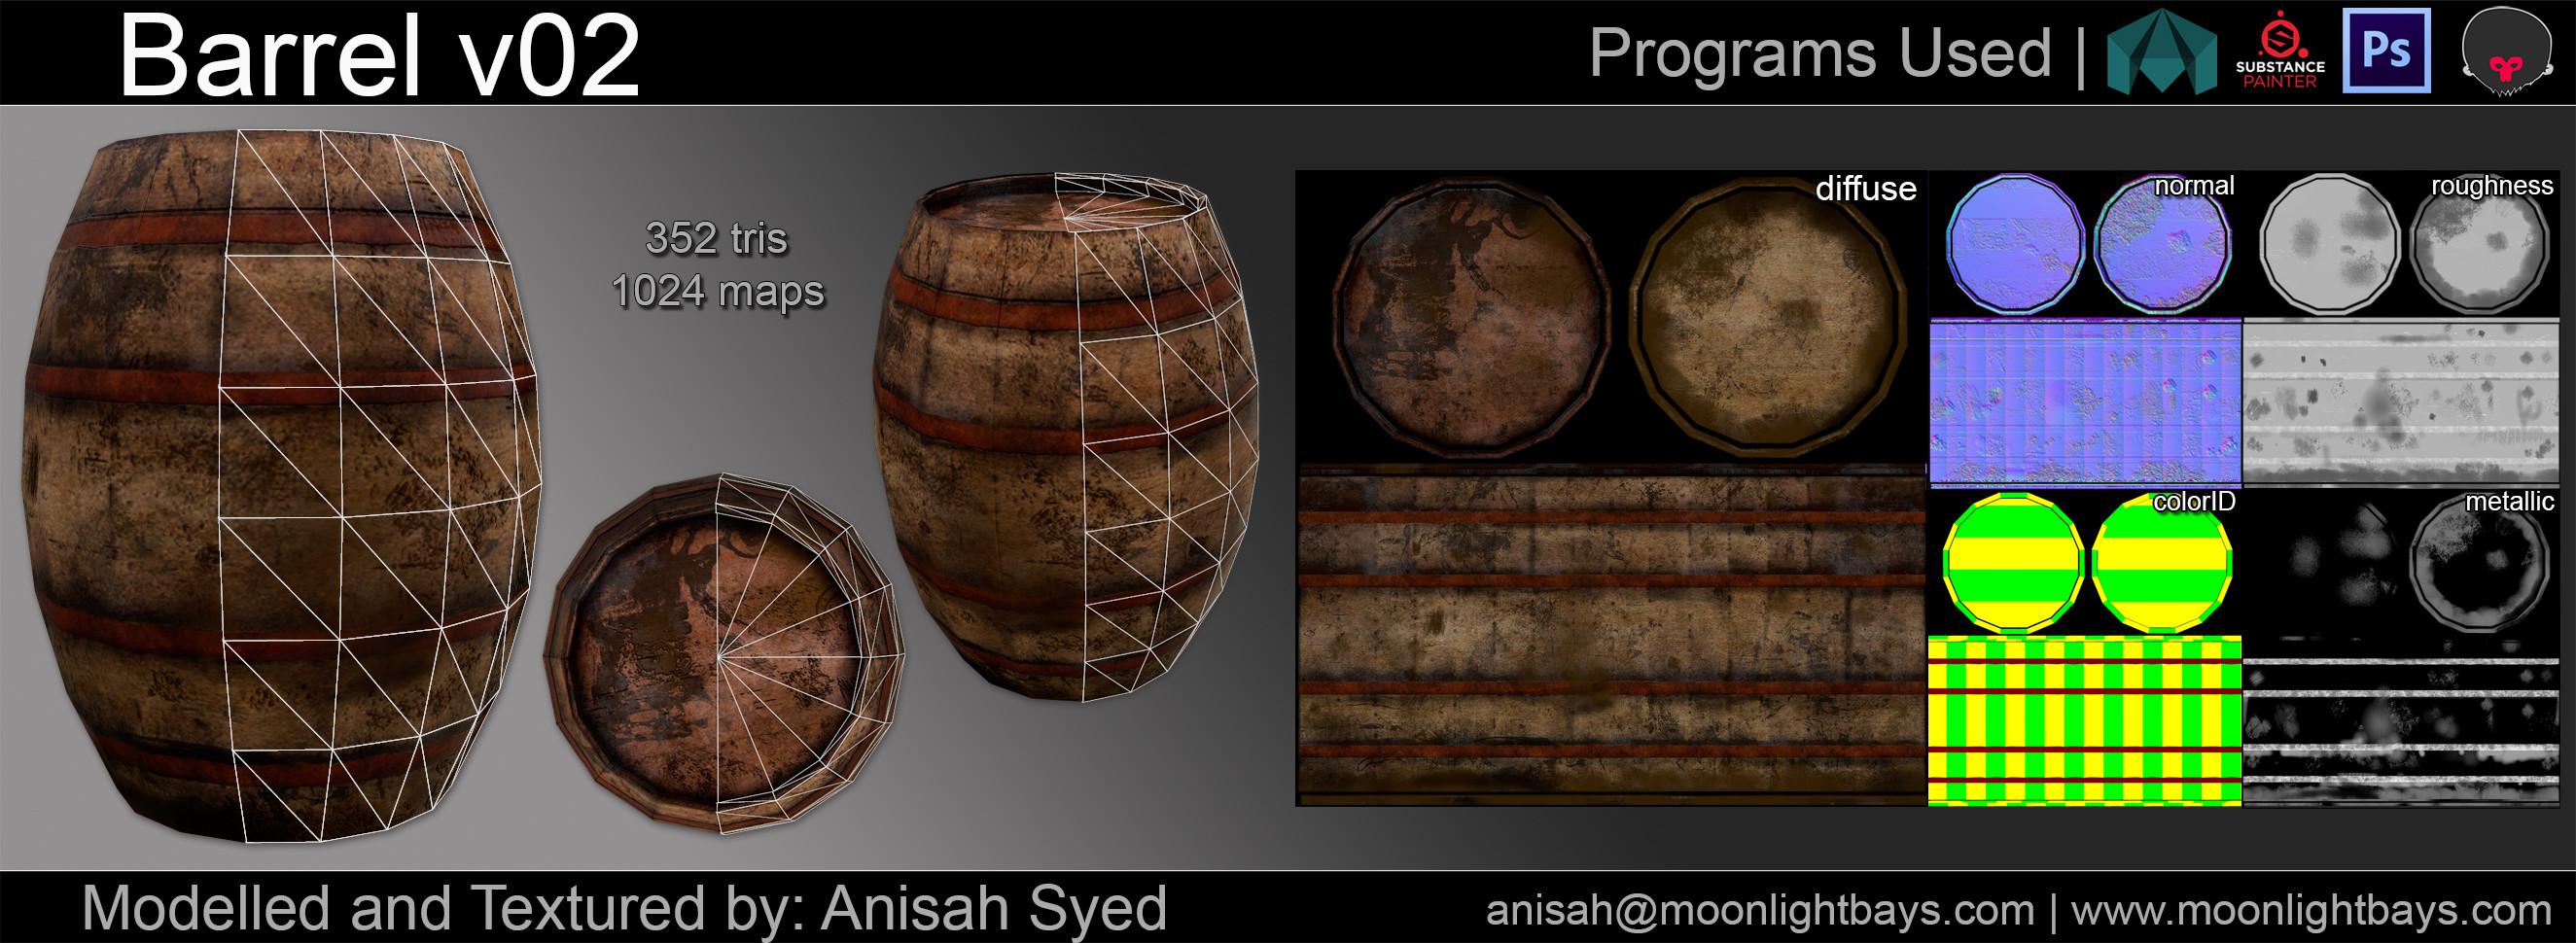 Barrel 02 - Presentation